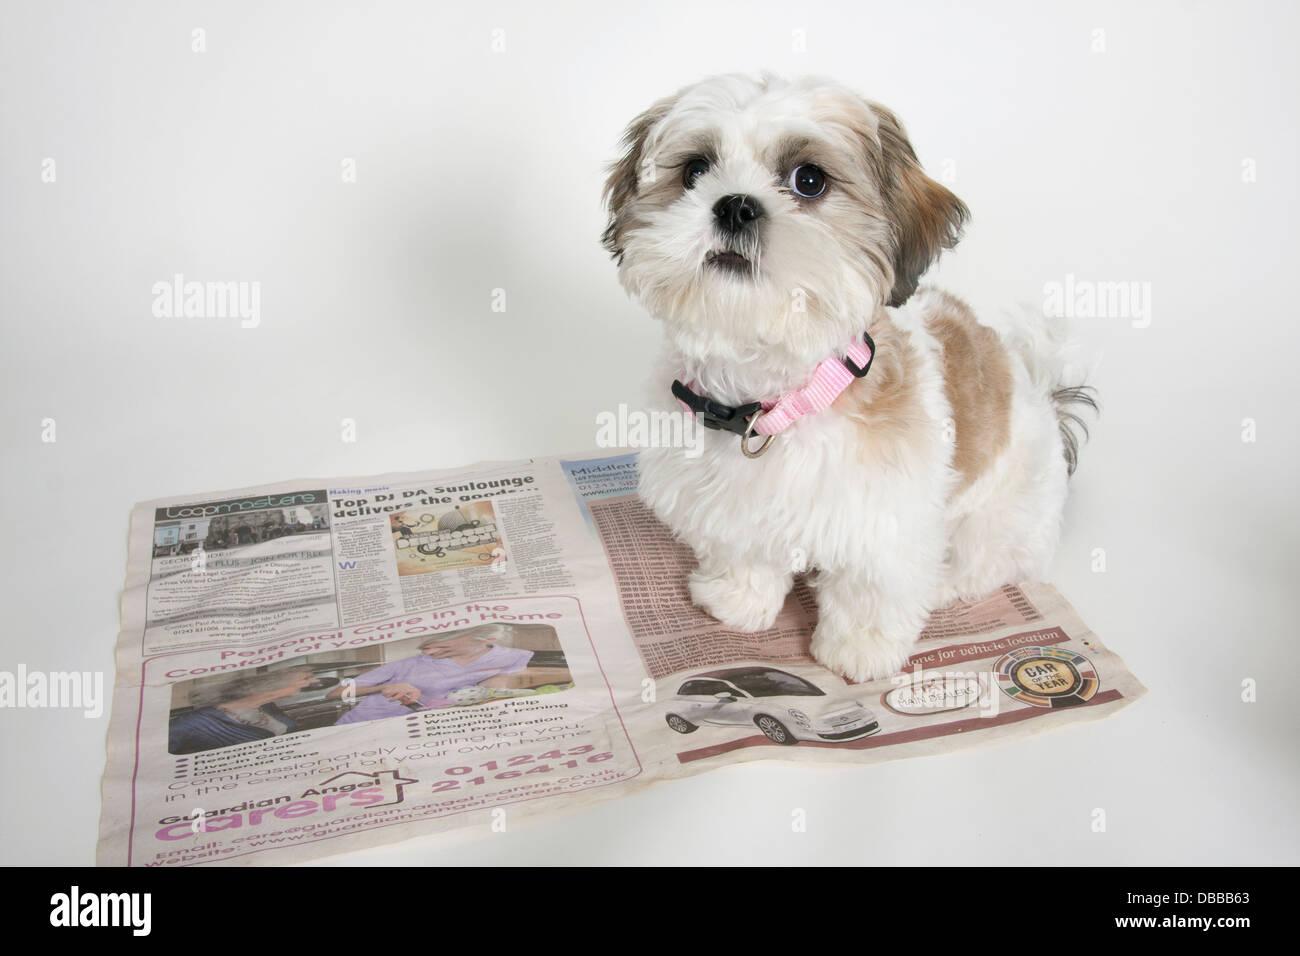 Shih Tzu Puppy Sitting On Newspaper Toilet Training Stock Photo